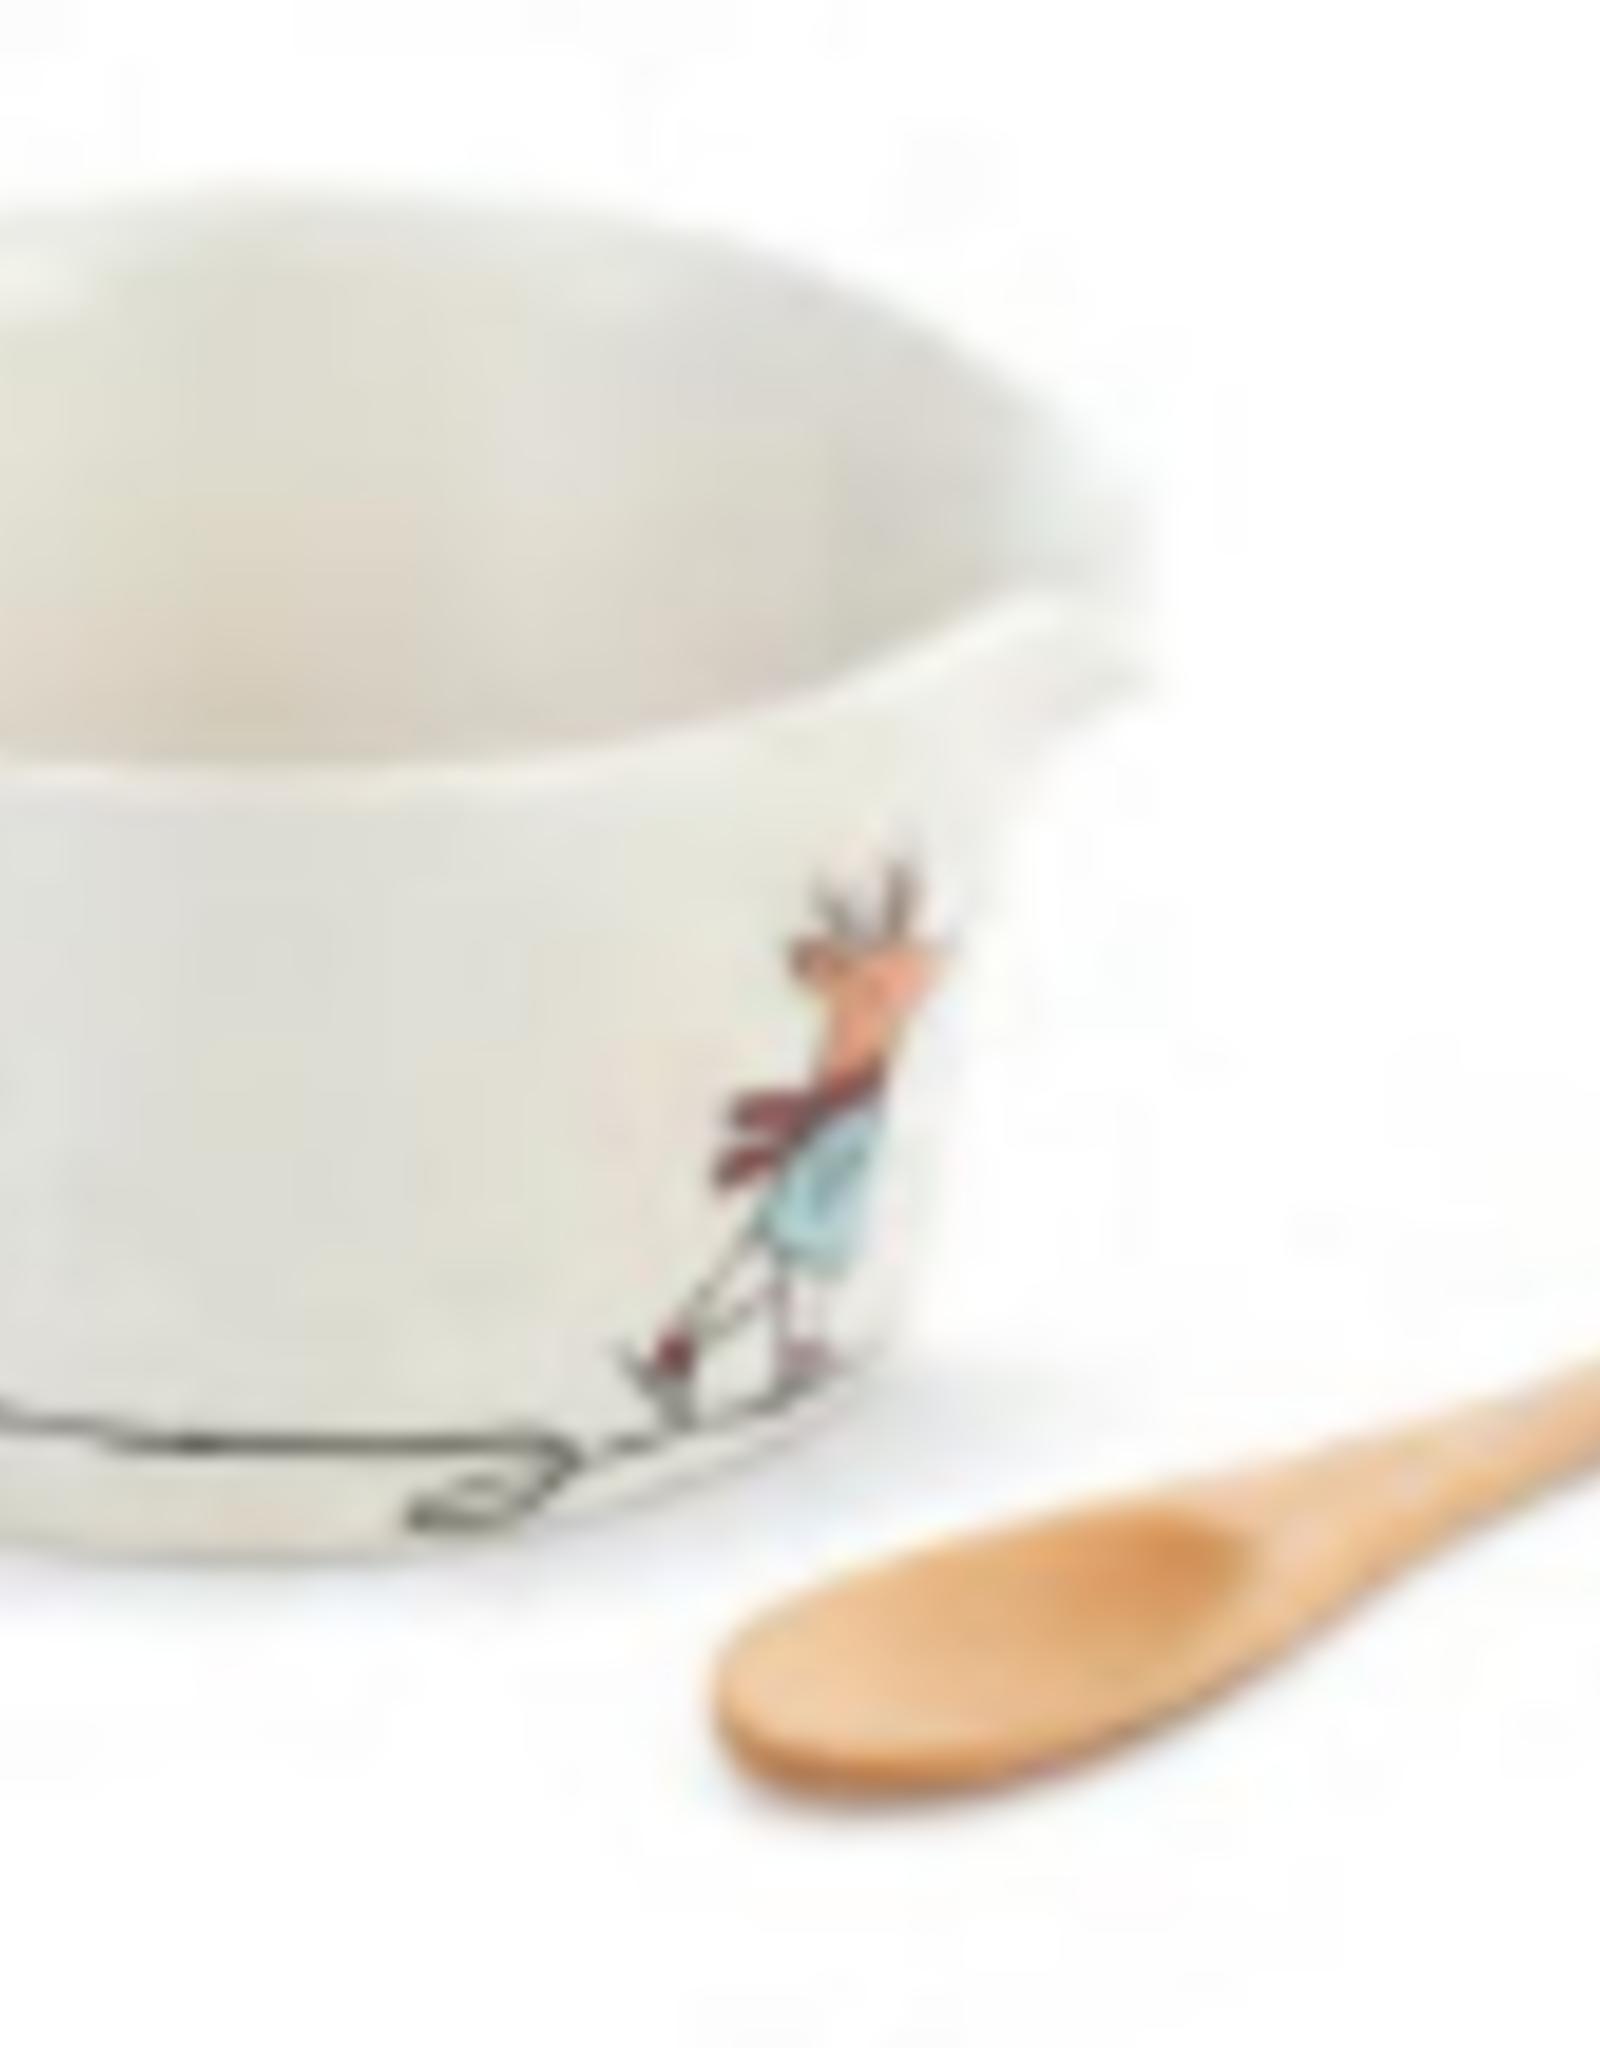 Skating Santa Appetizer Bowl/Spoon